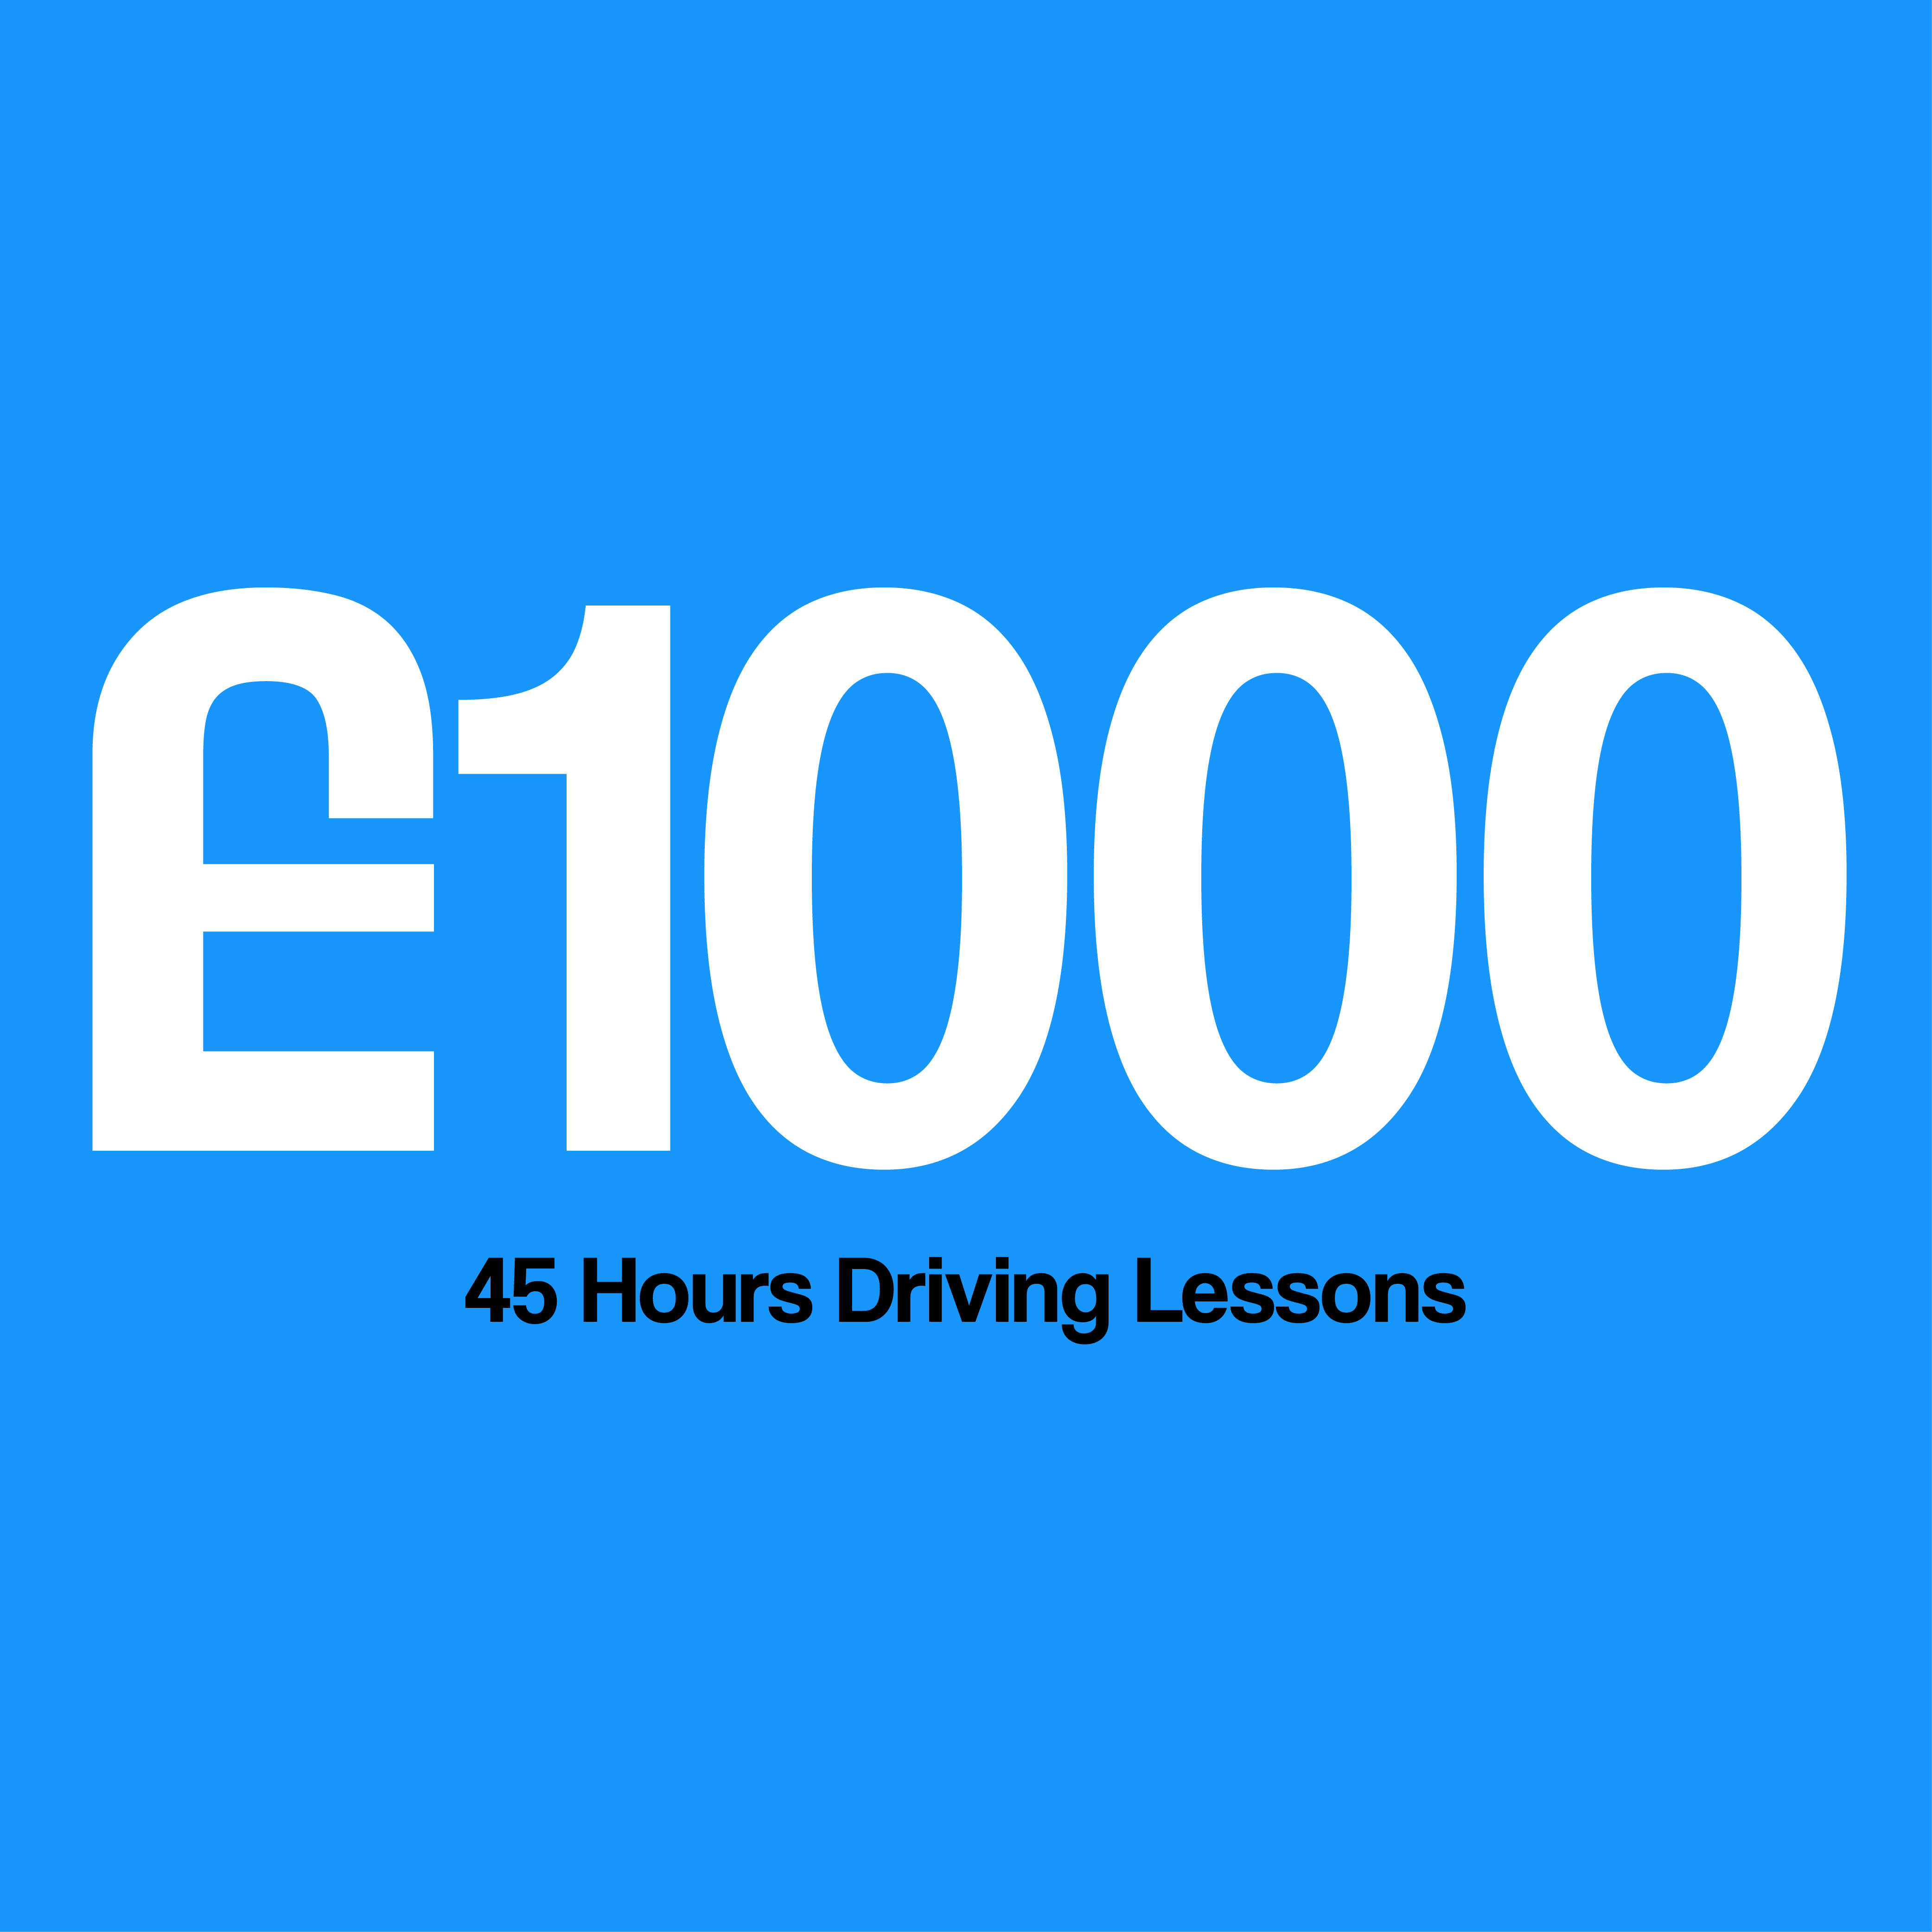 DSM School Of Motoring 45 Hours Driving Lessons